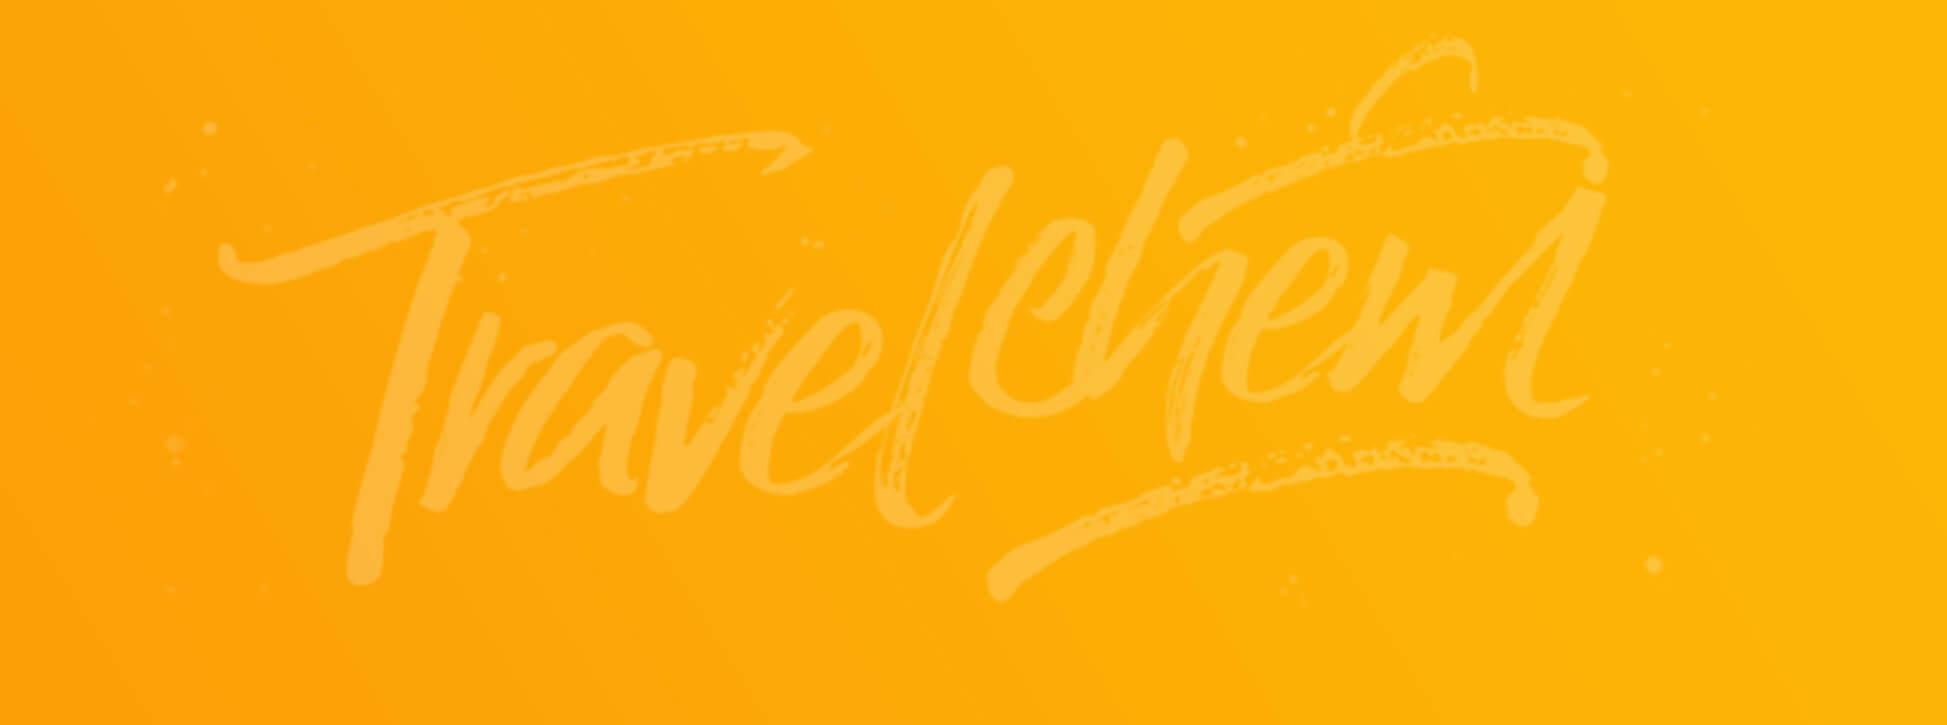 Web/mobile design and development, corporate websites, online-store, landing pages. Travel blog case